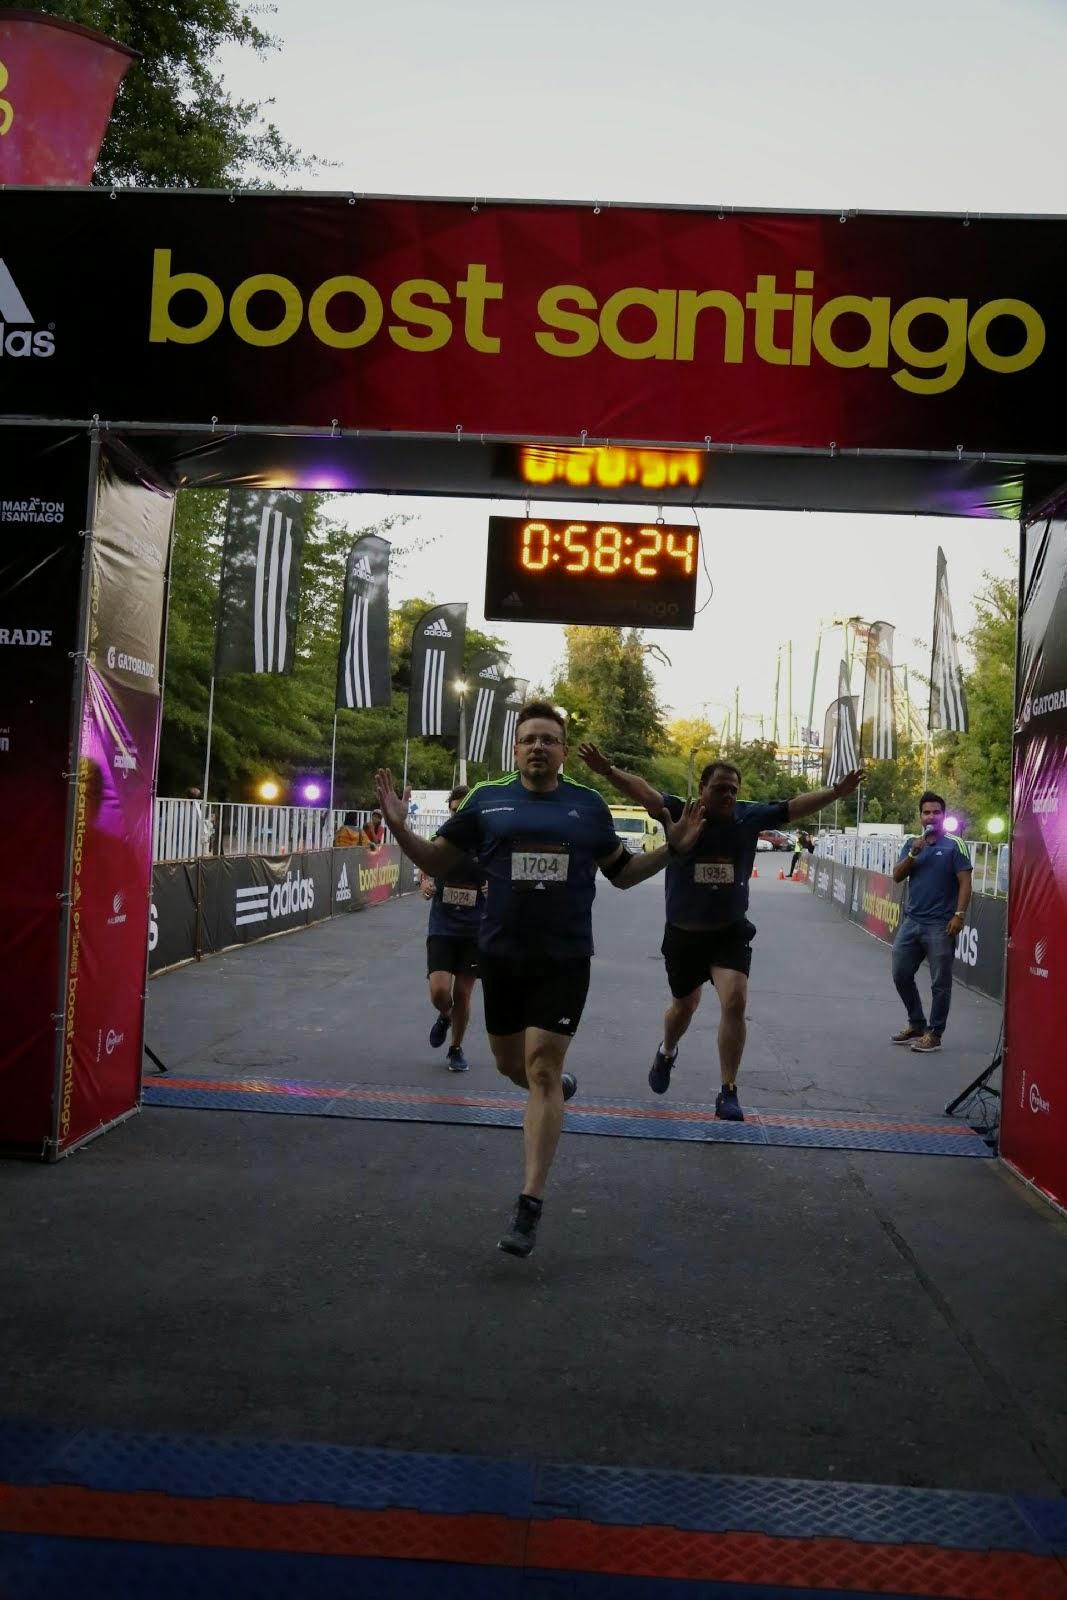 Llegada Santiago Boost